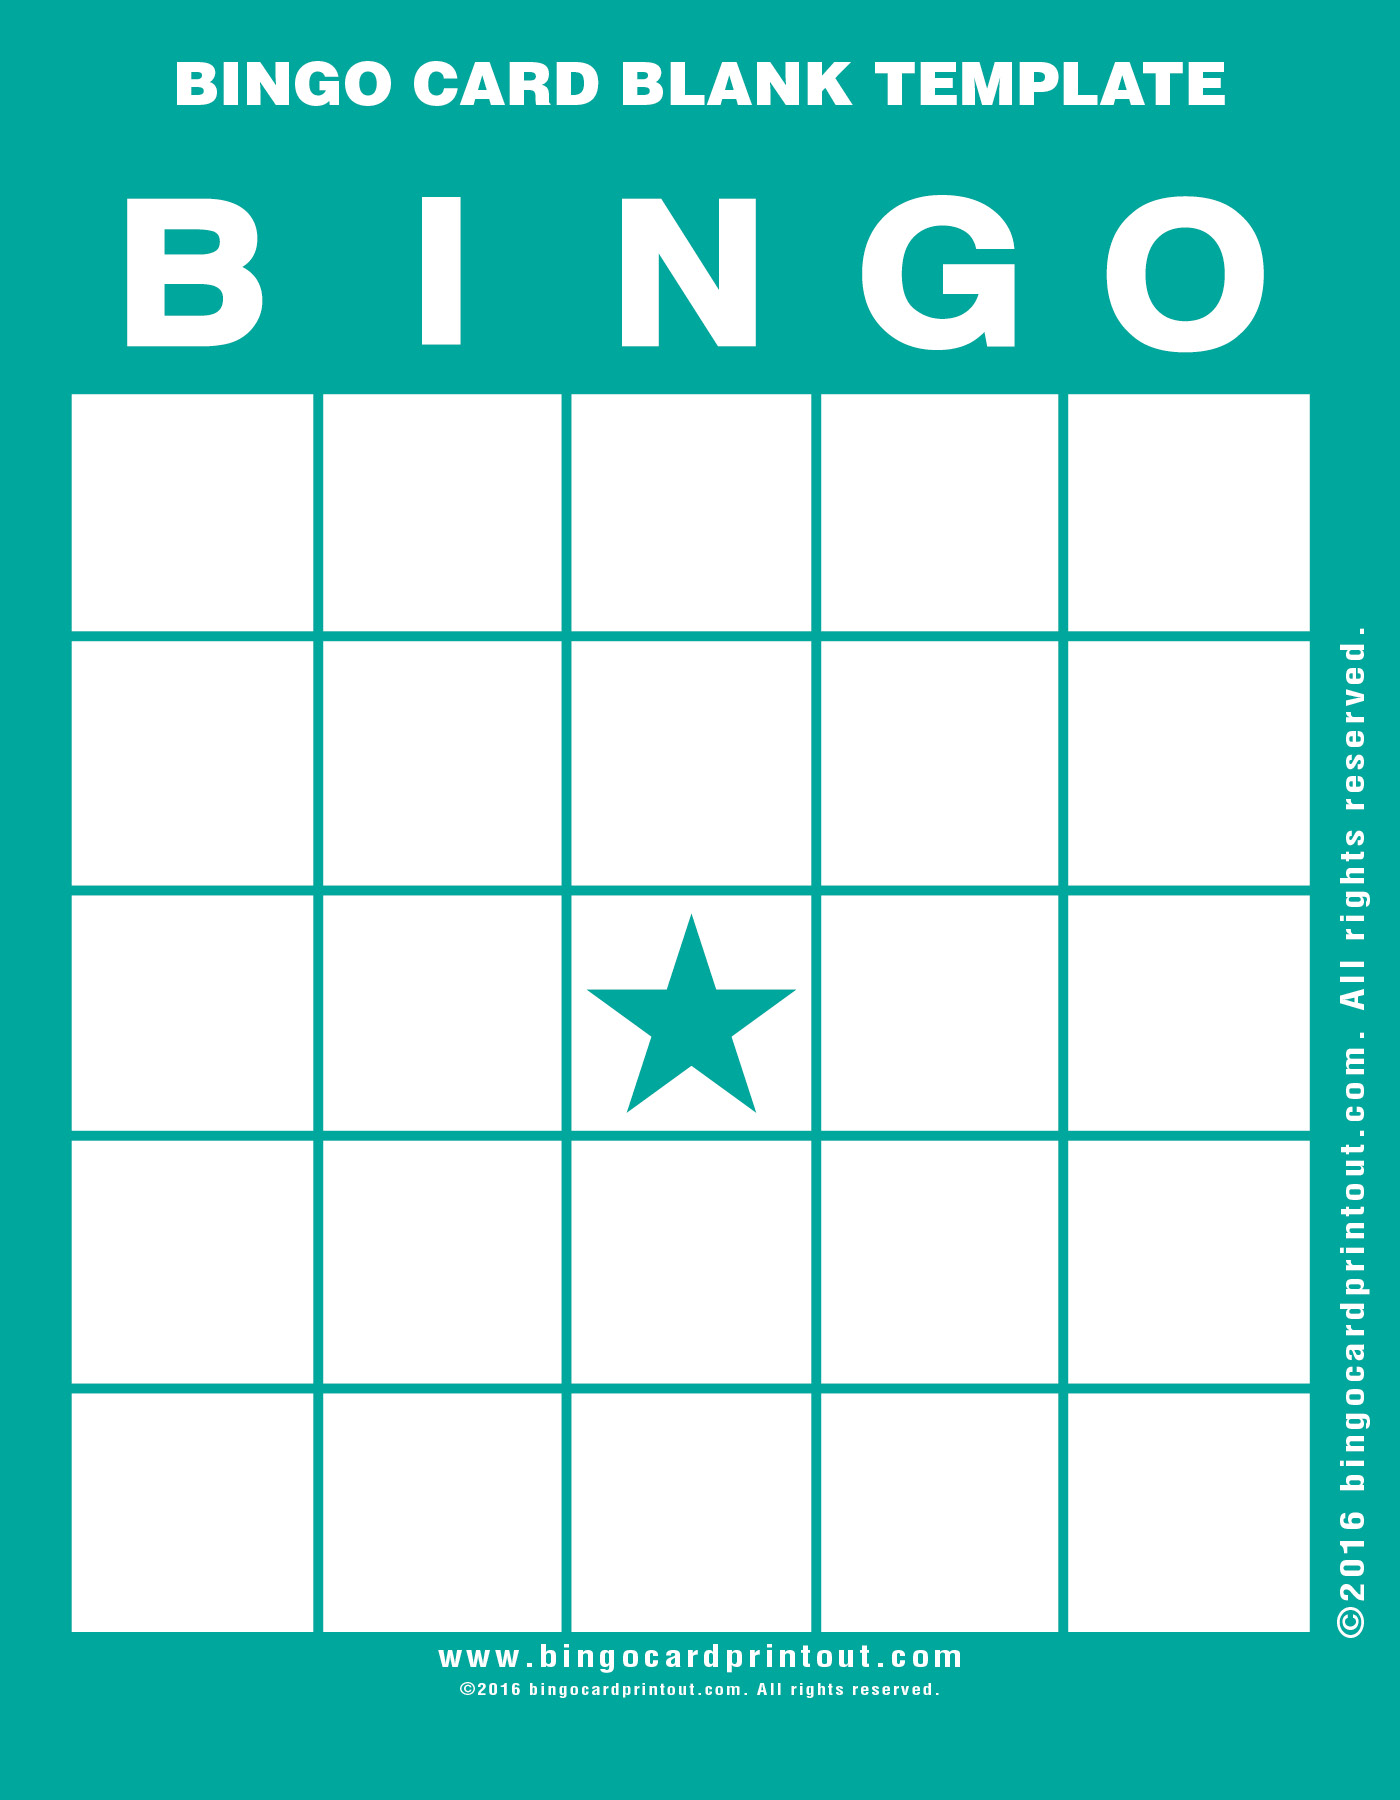 Bingo Card Blank Template